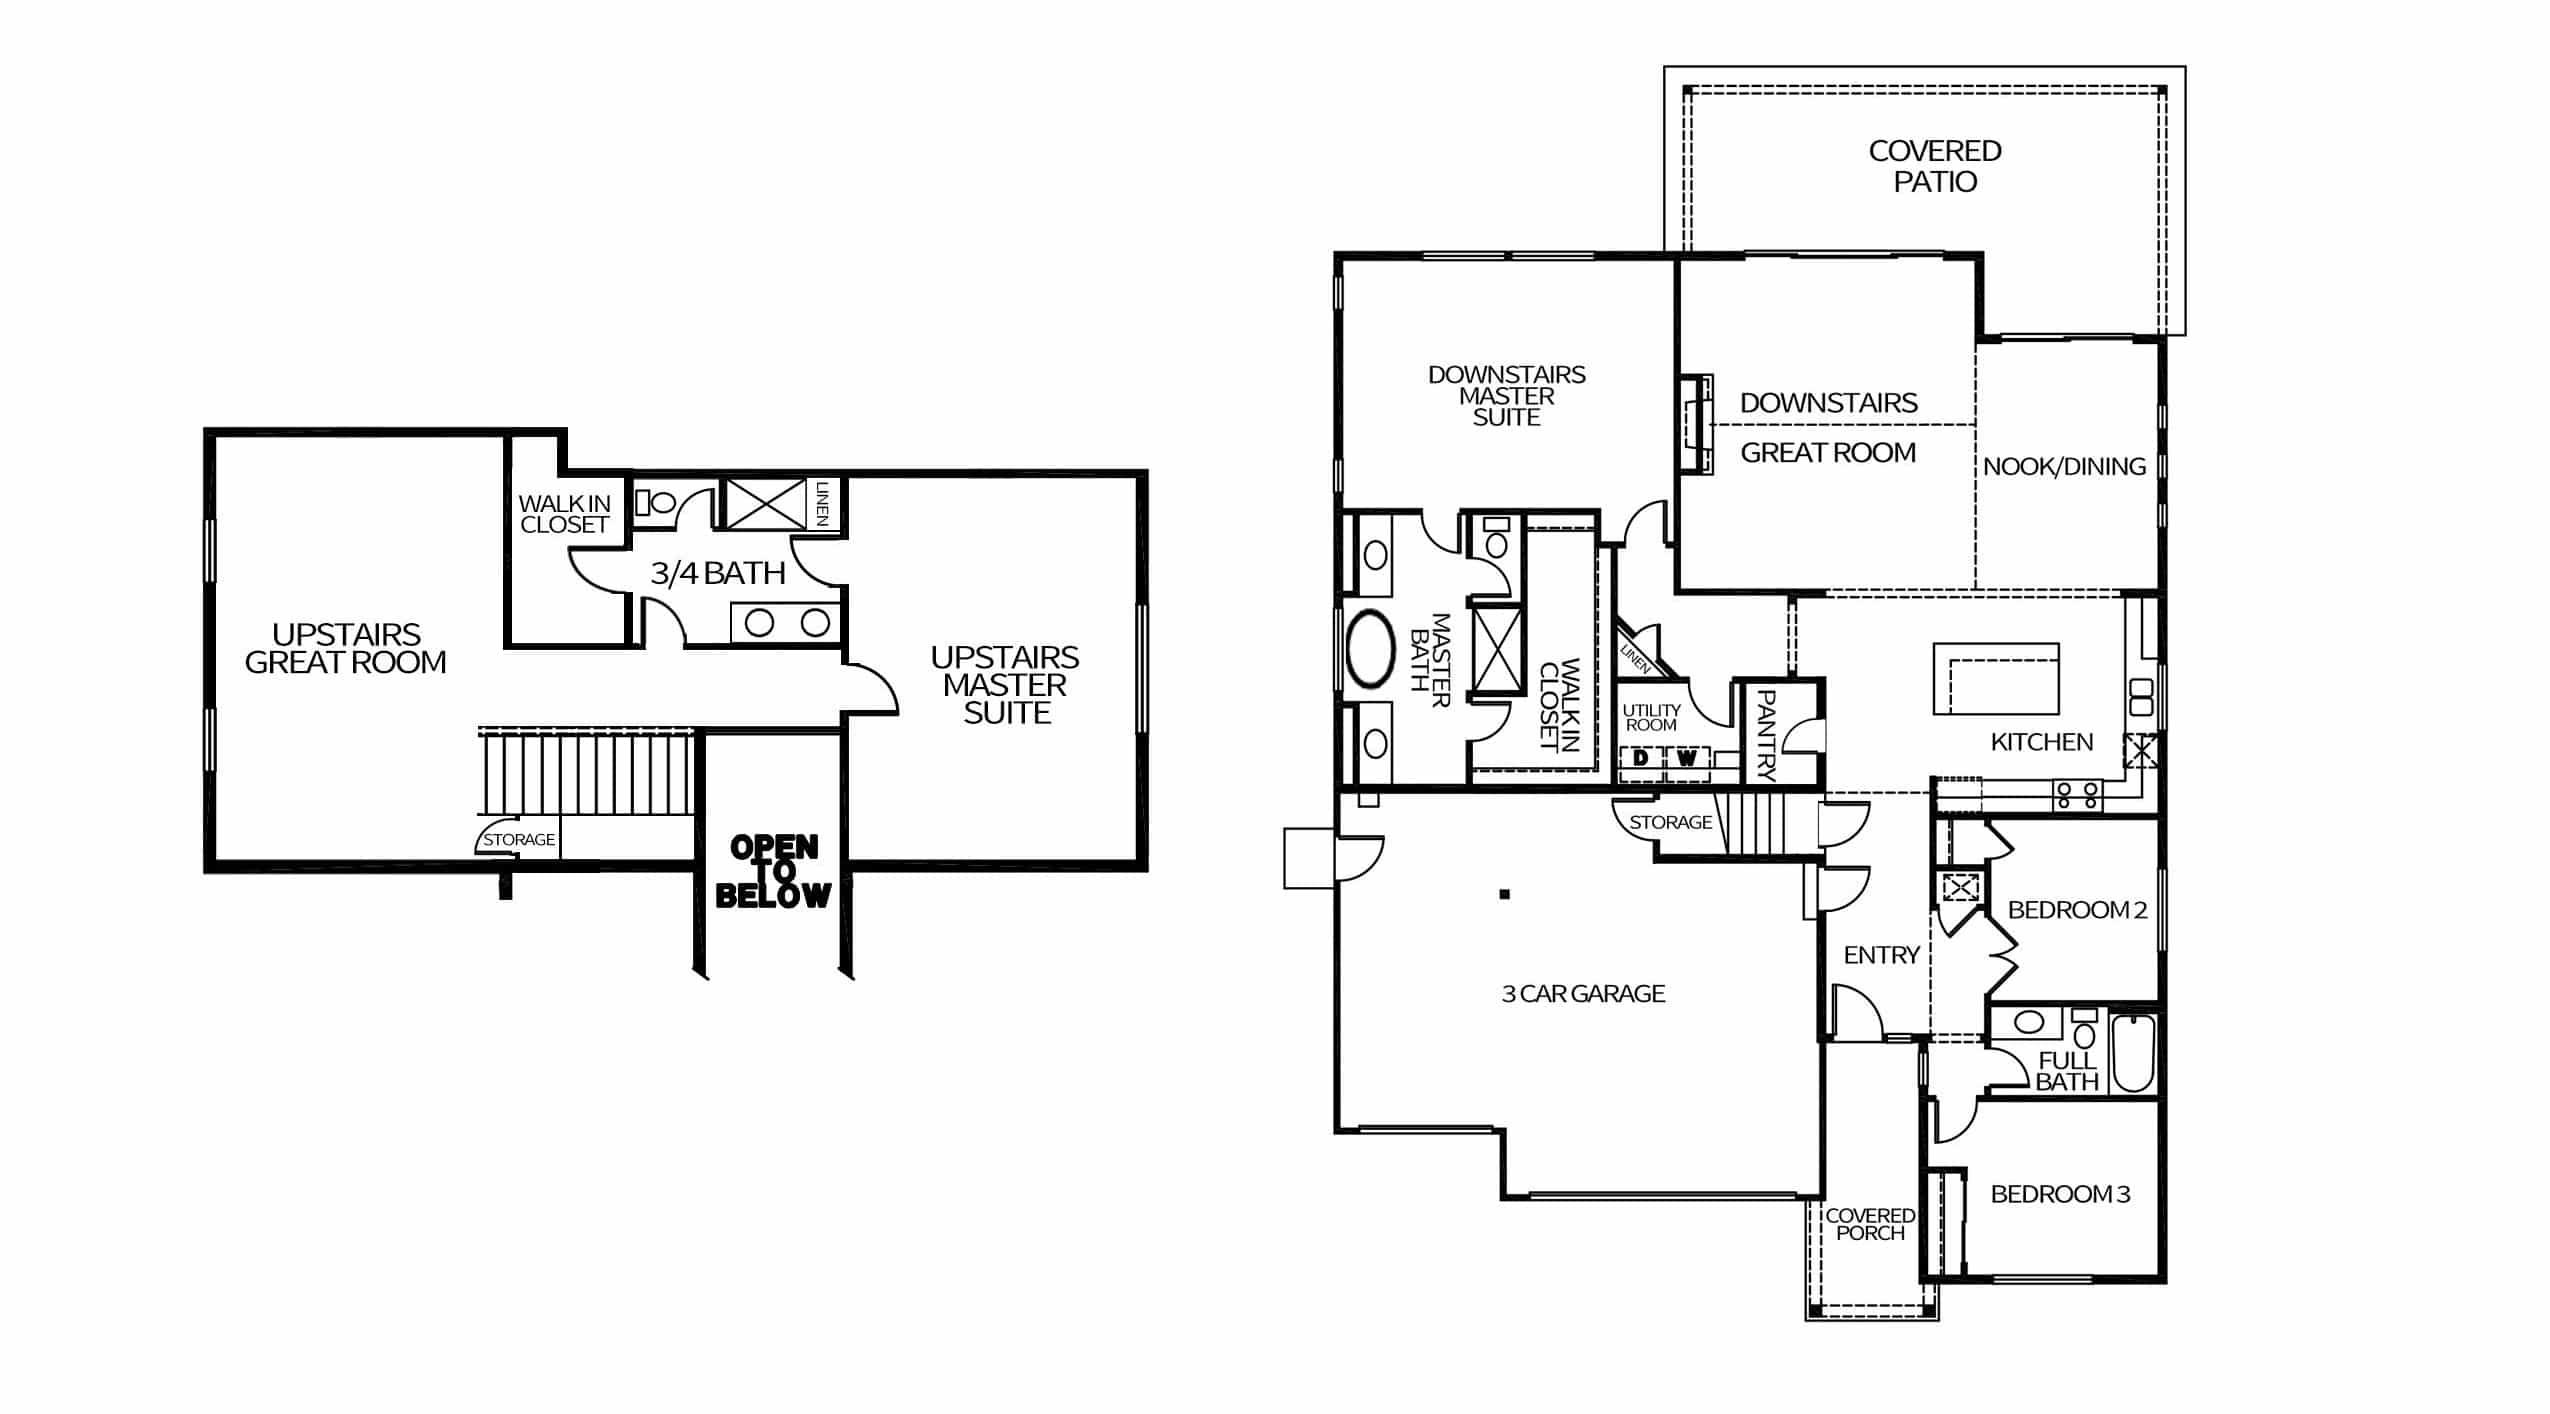 soundbuilt-ainsworth-multi-gen-2992-floorplan